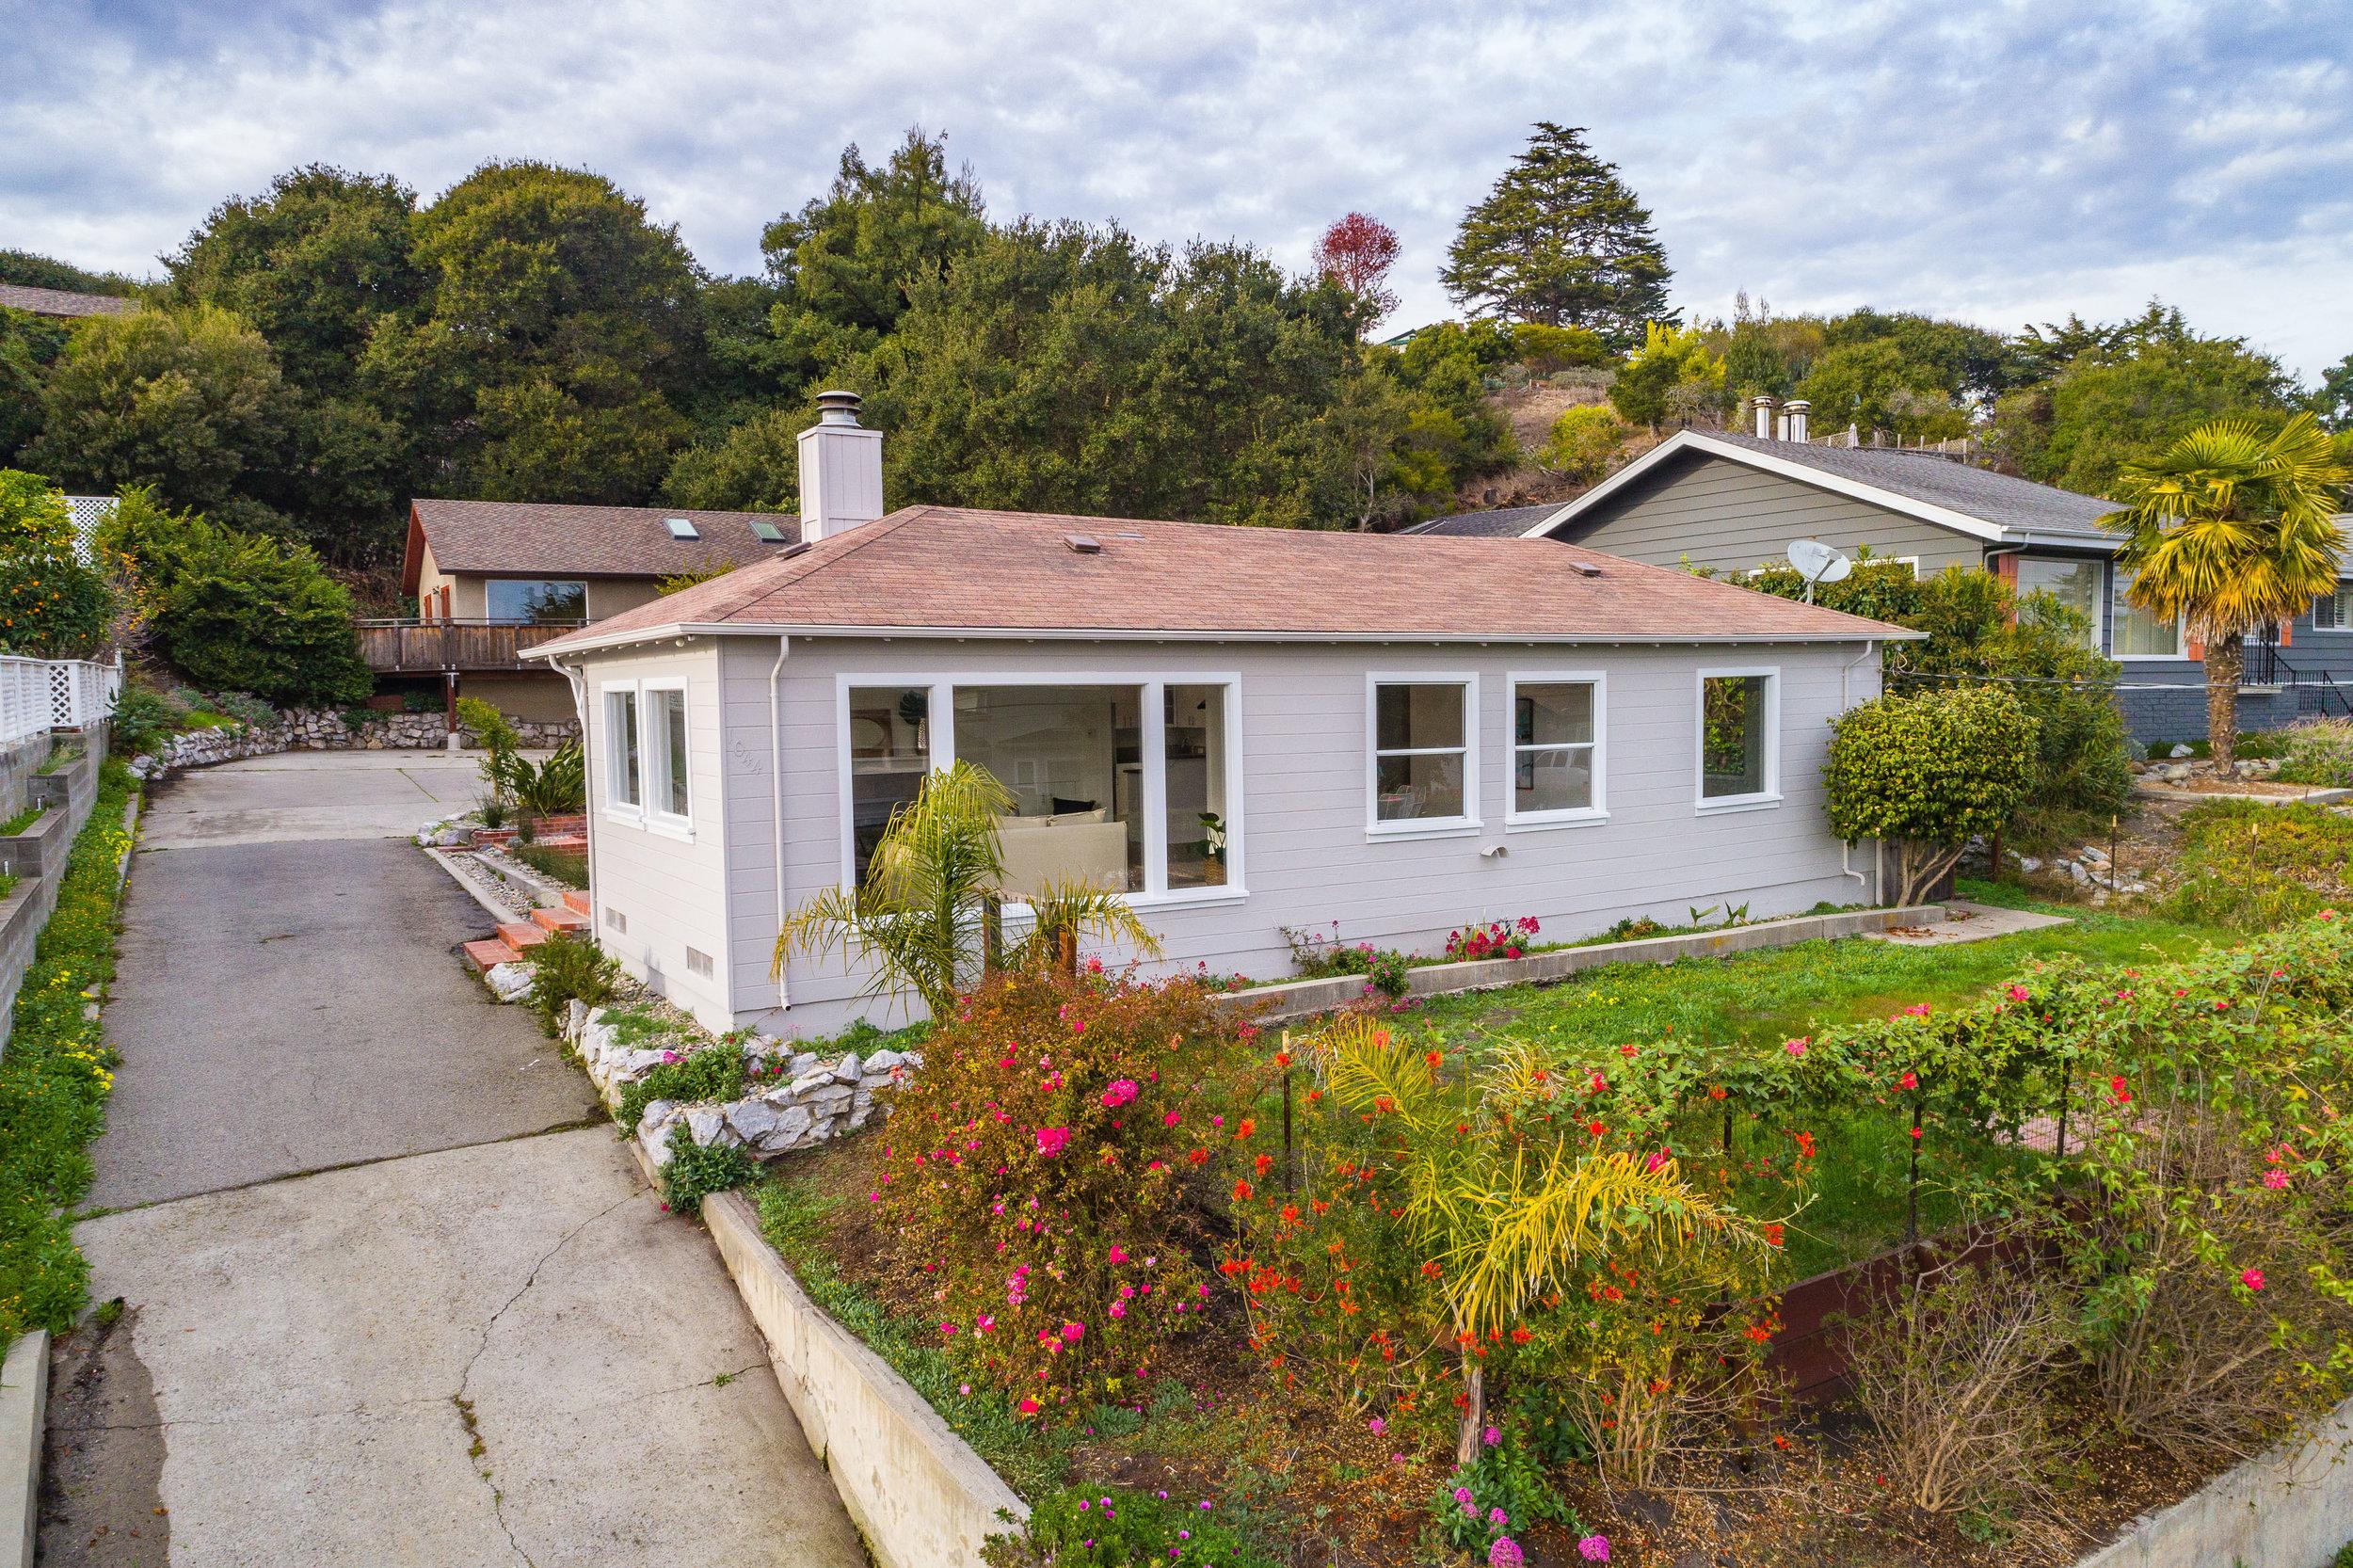 Real Estate Office In Santa Cruz 1736 Sq Ft Home In Westlake Sch